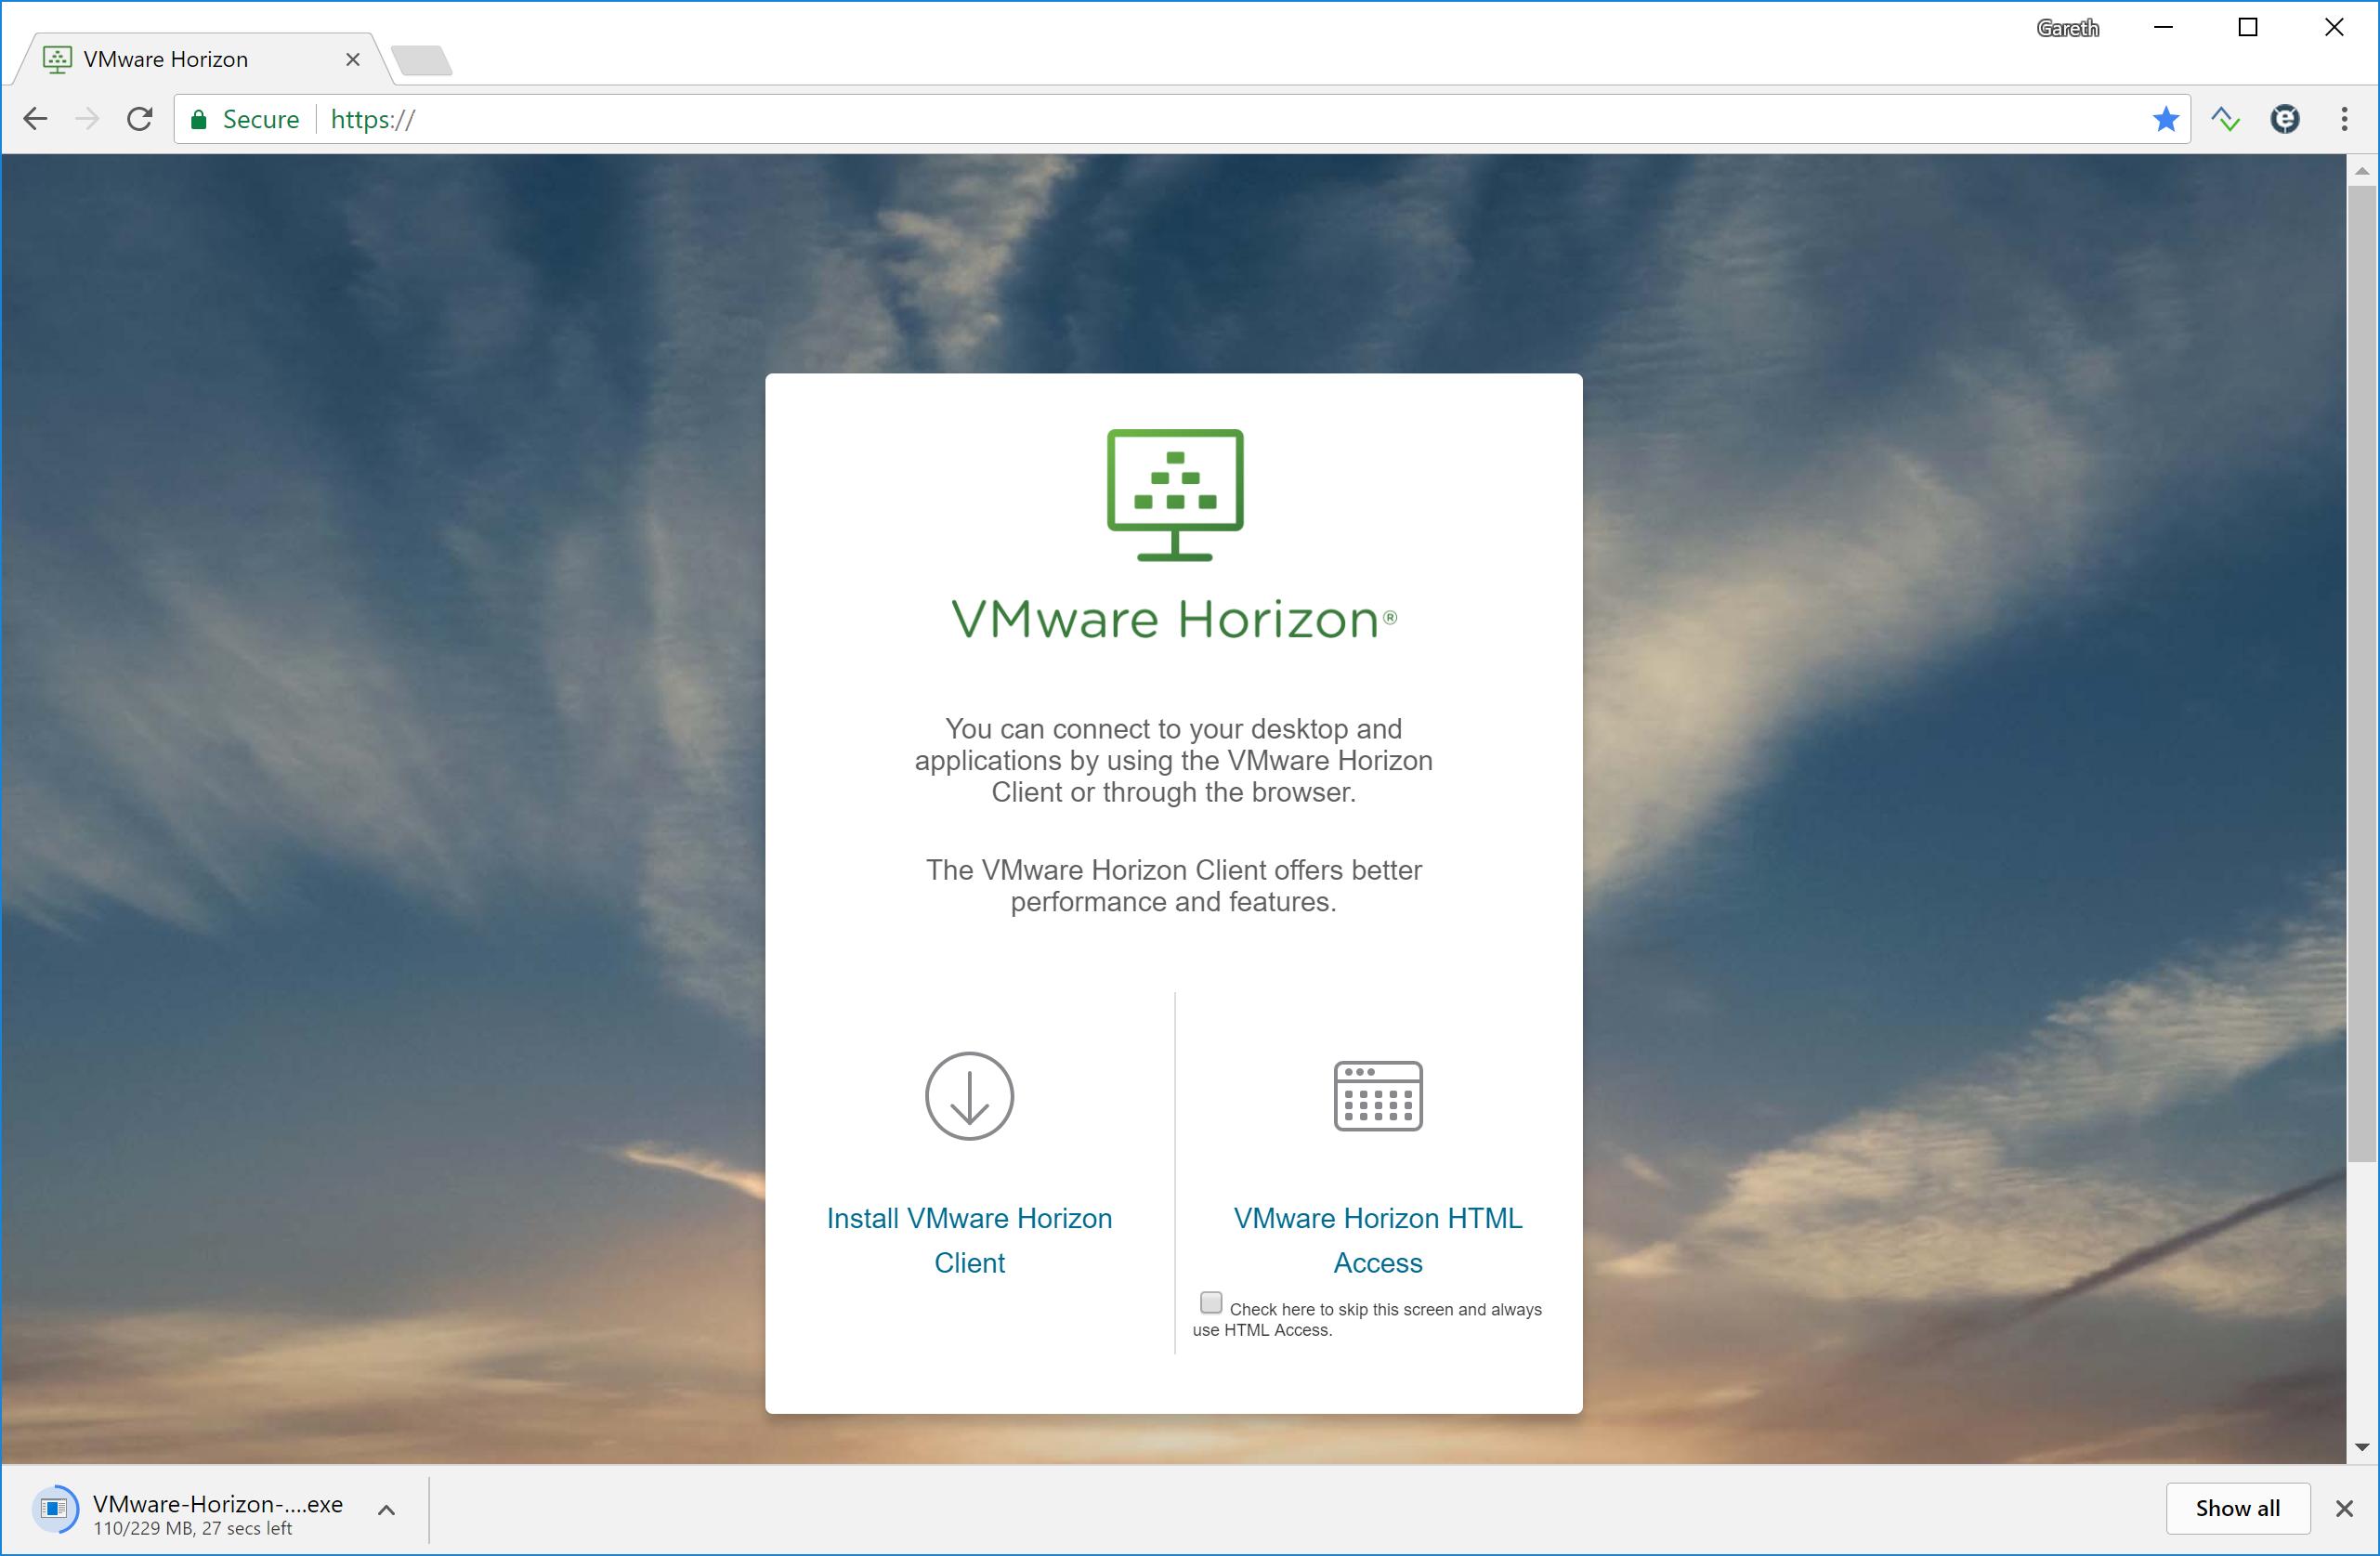 Customising the VMware Horizon Web Portal